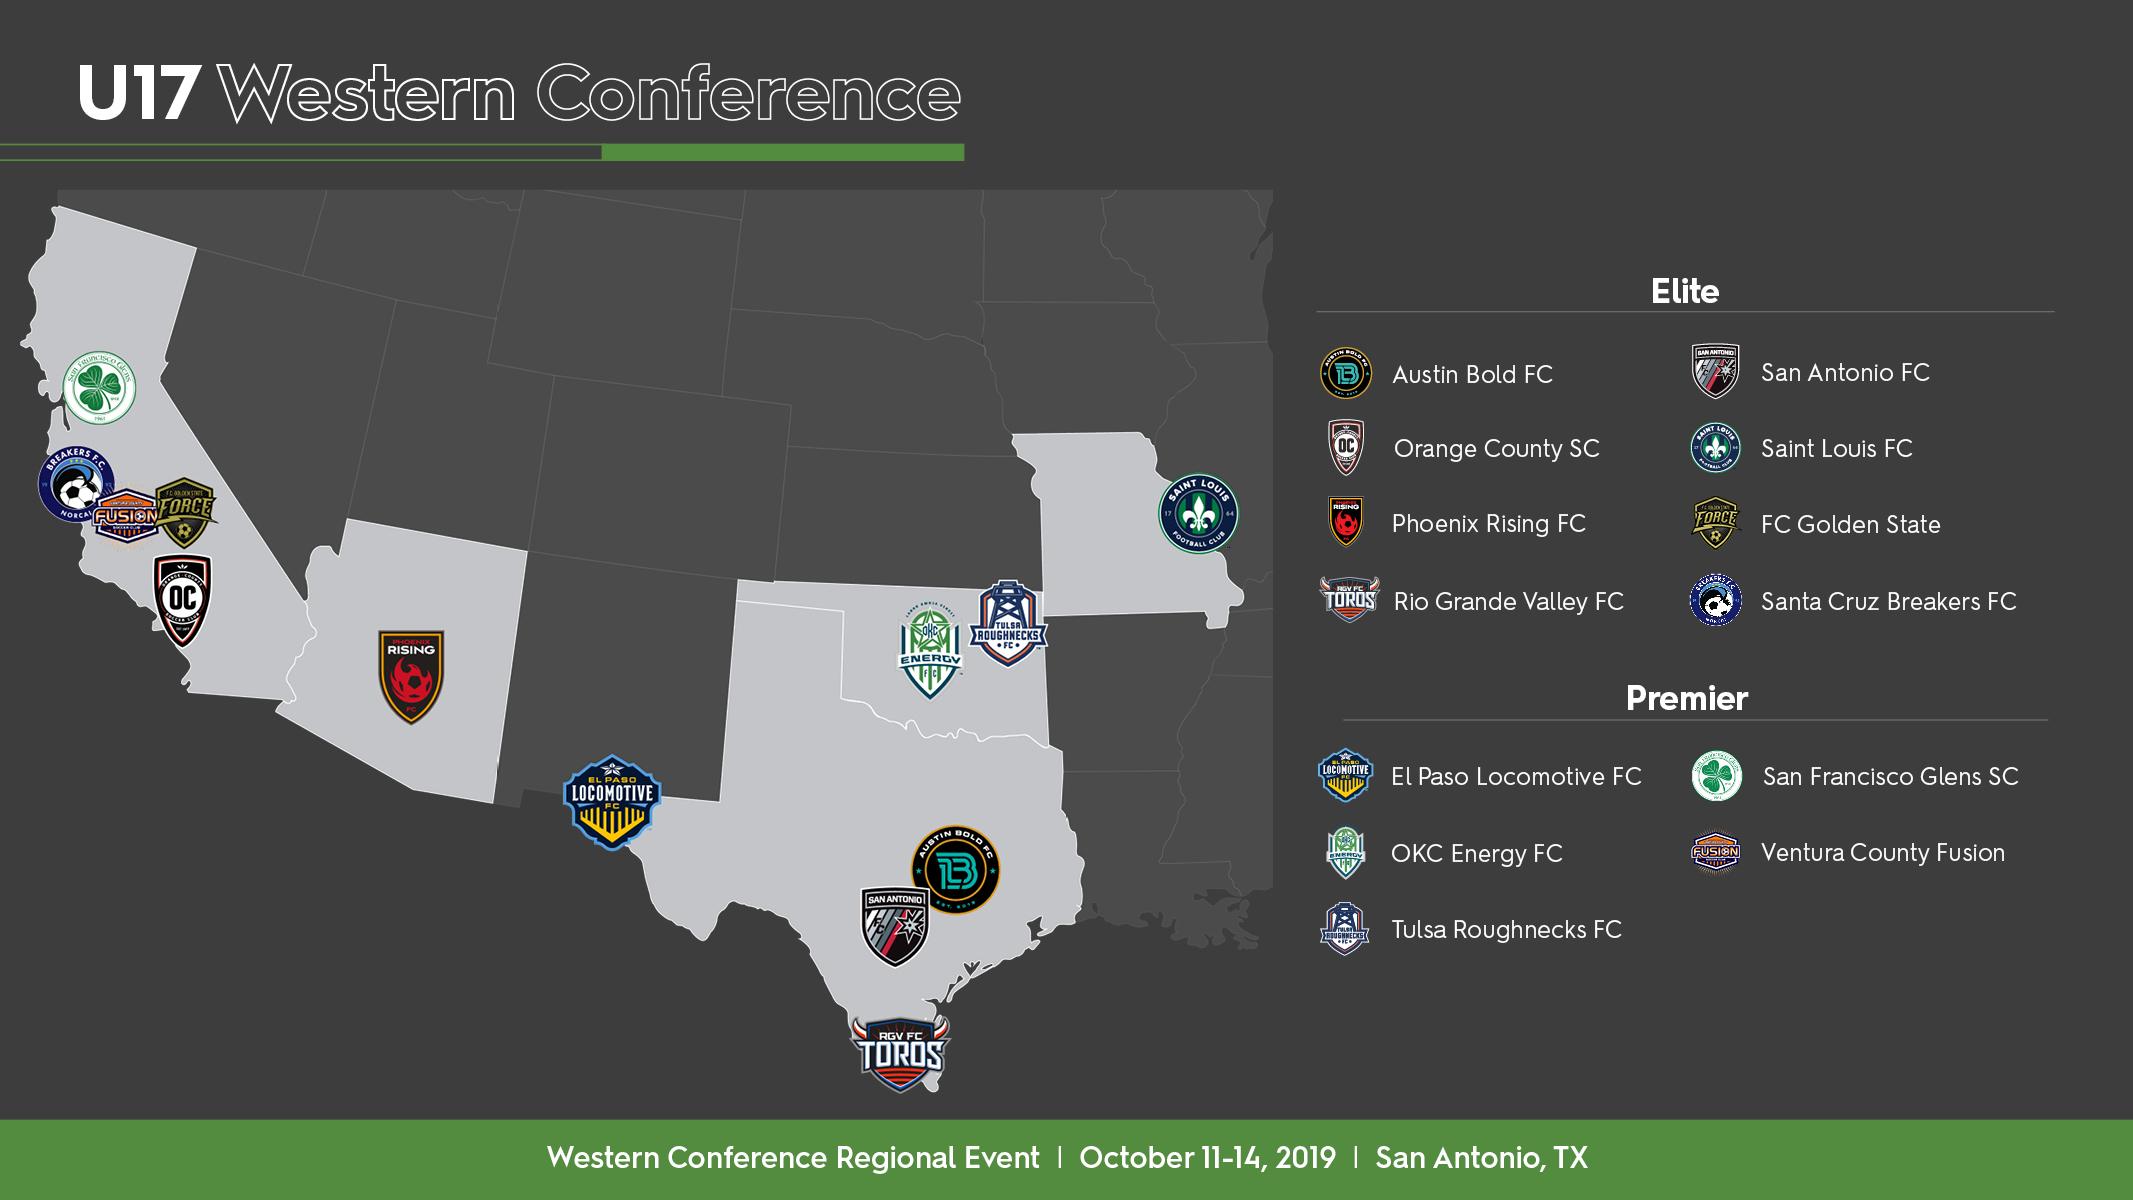 U17 Western Conference